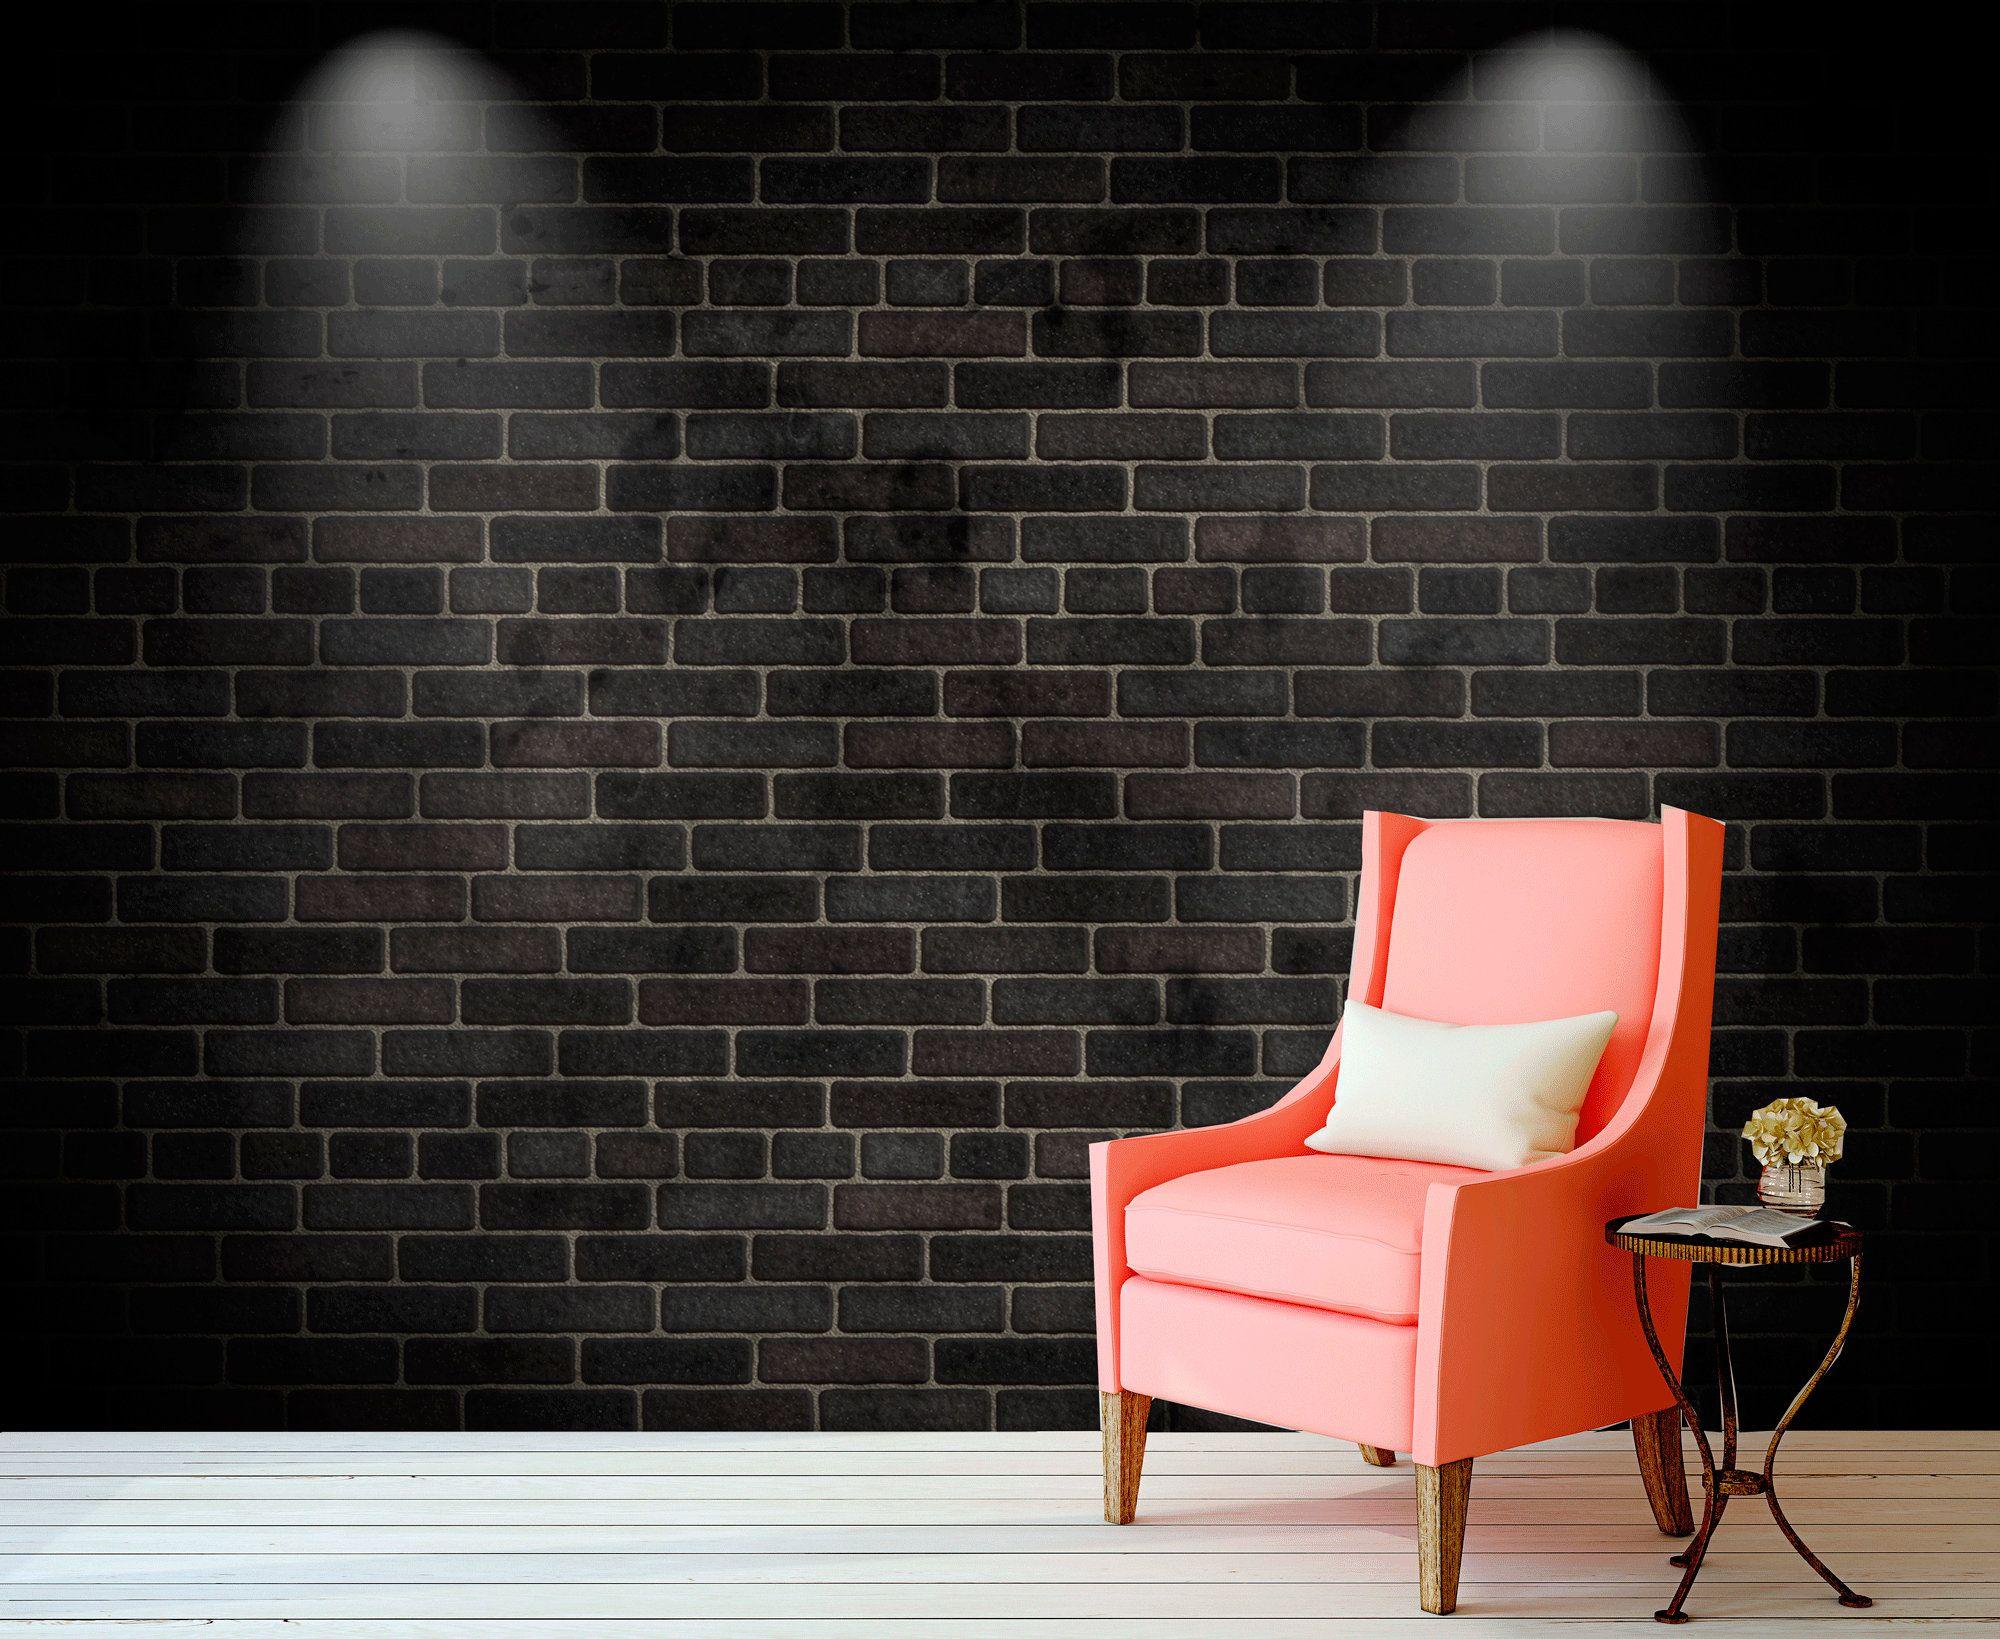 Dark Grey Brick Removable Wallpaper Black Bricks Temporary Etsy Removable Brick Wallpaper Brick Temporary Wallpaper Rustic Wallpaper